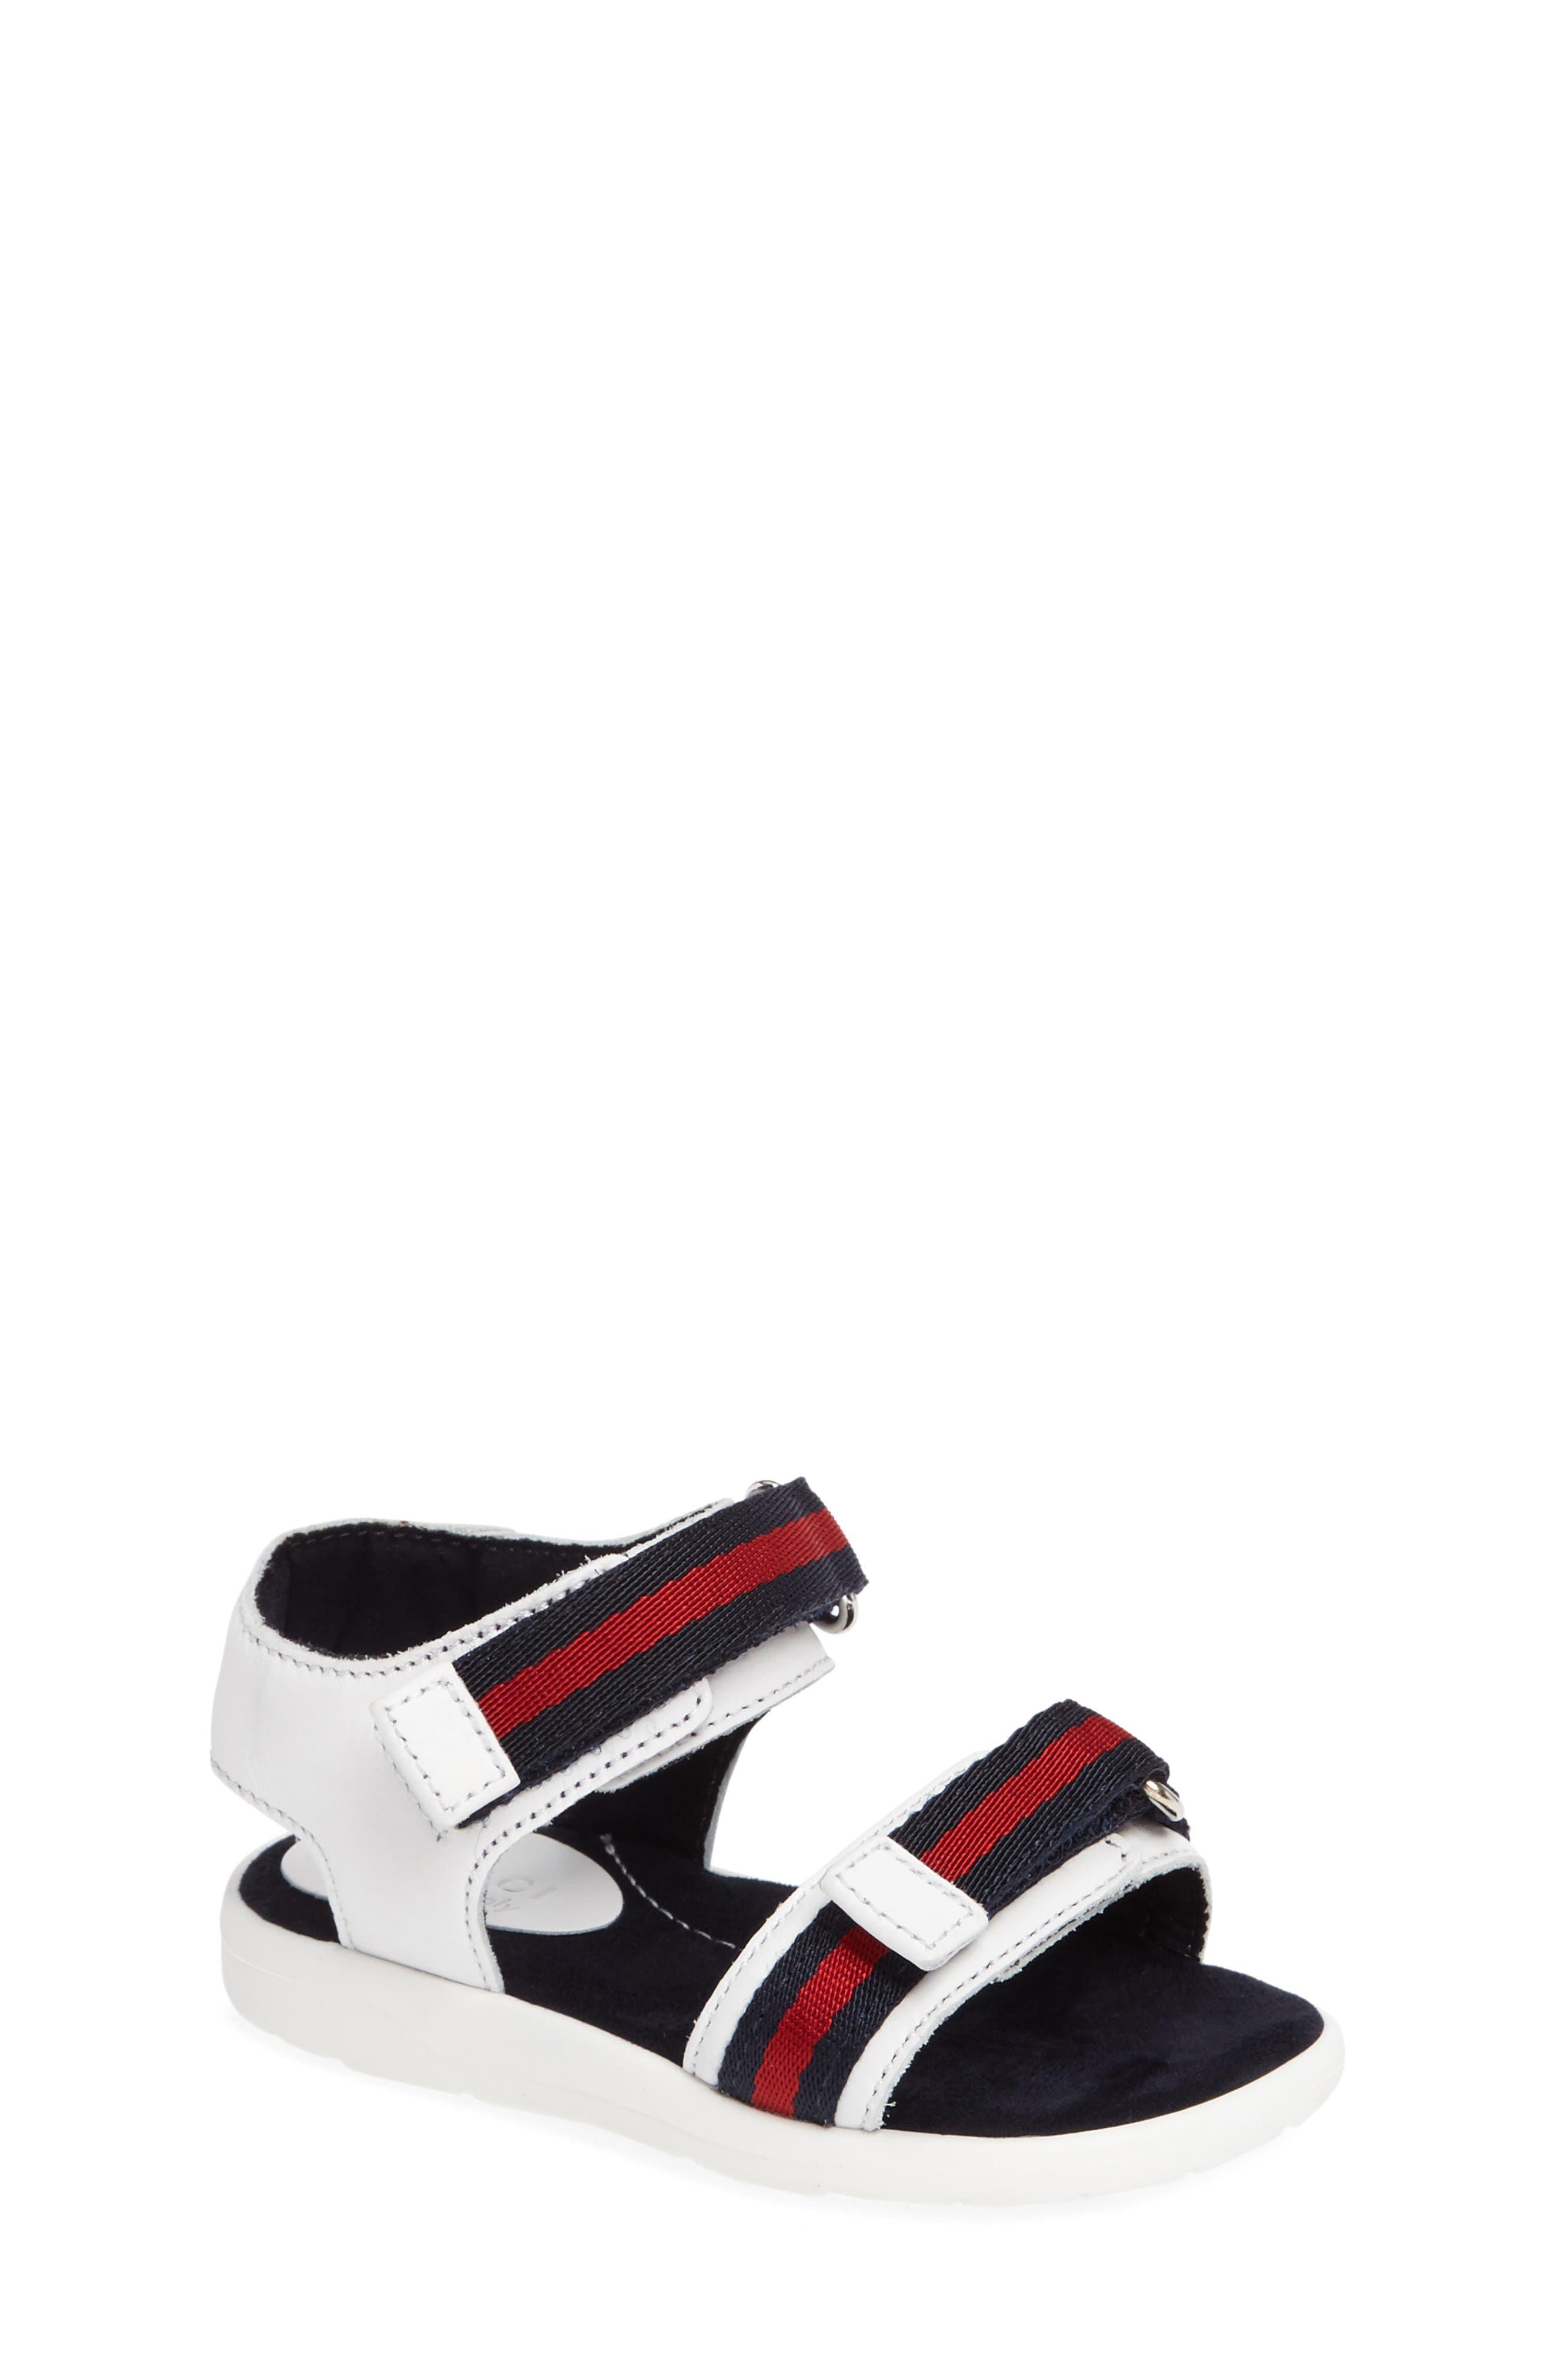 Gucci Stripe Web Sandal (Baby, Walker & Toddler)